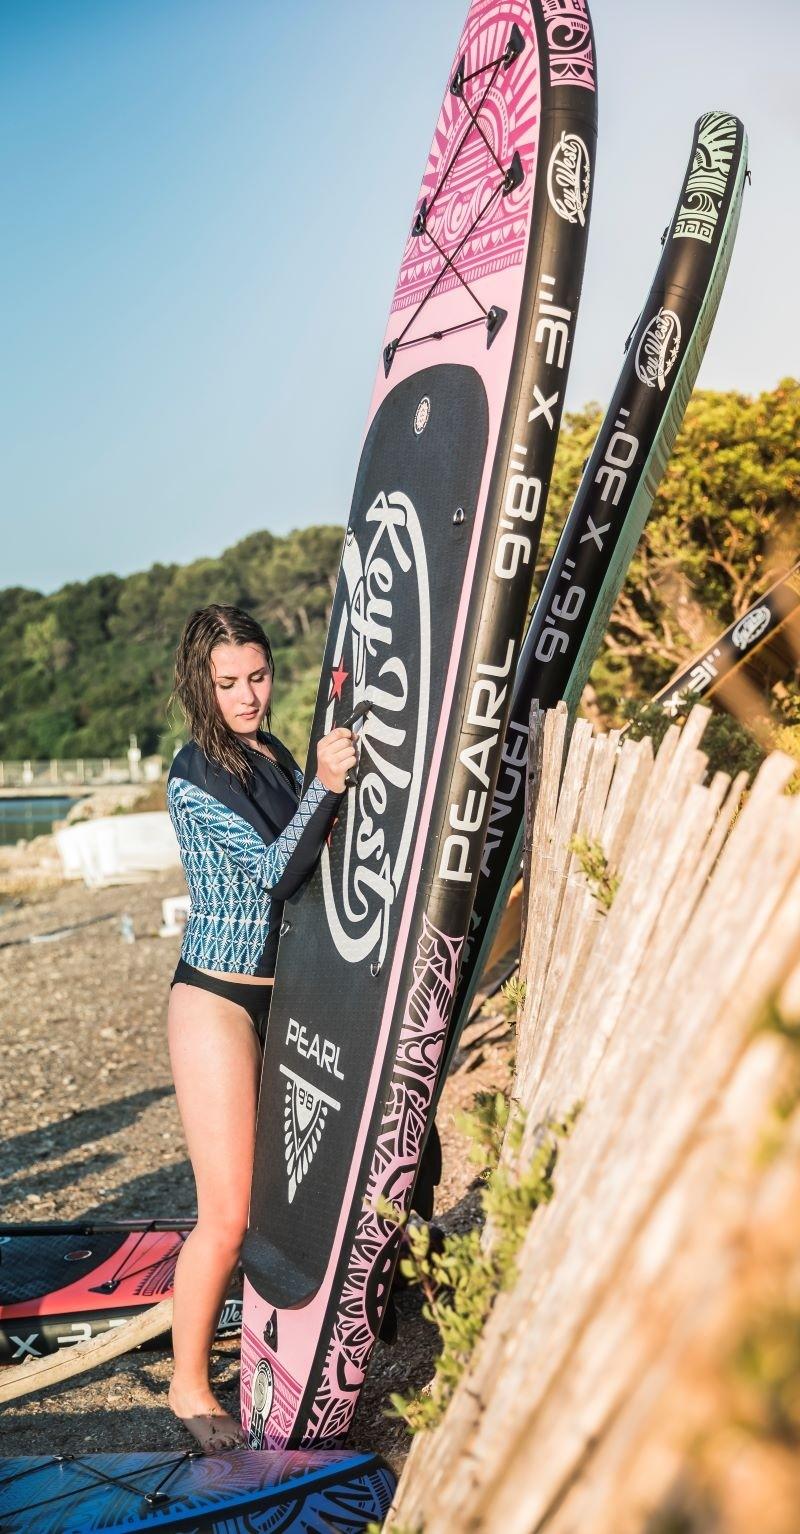 paddle-gonflable-rose-key-west-pearl PADDLE KEY WEST sports nautic.jpg